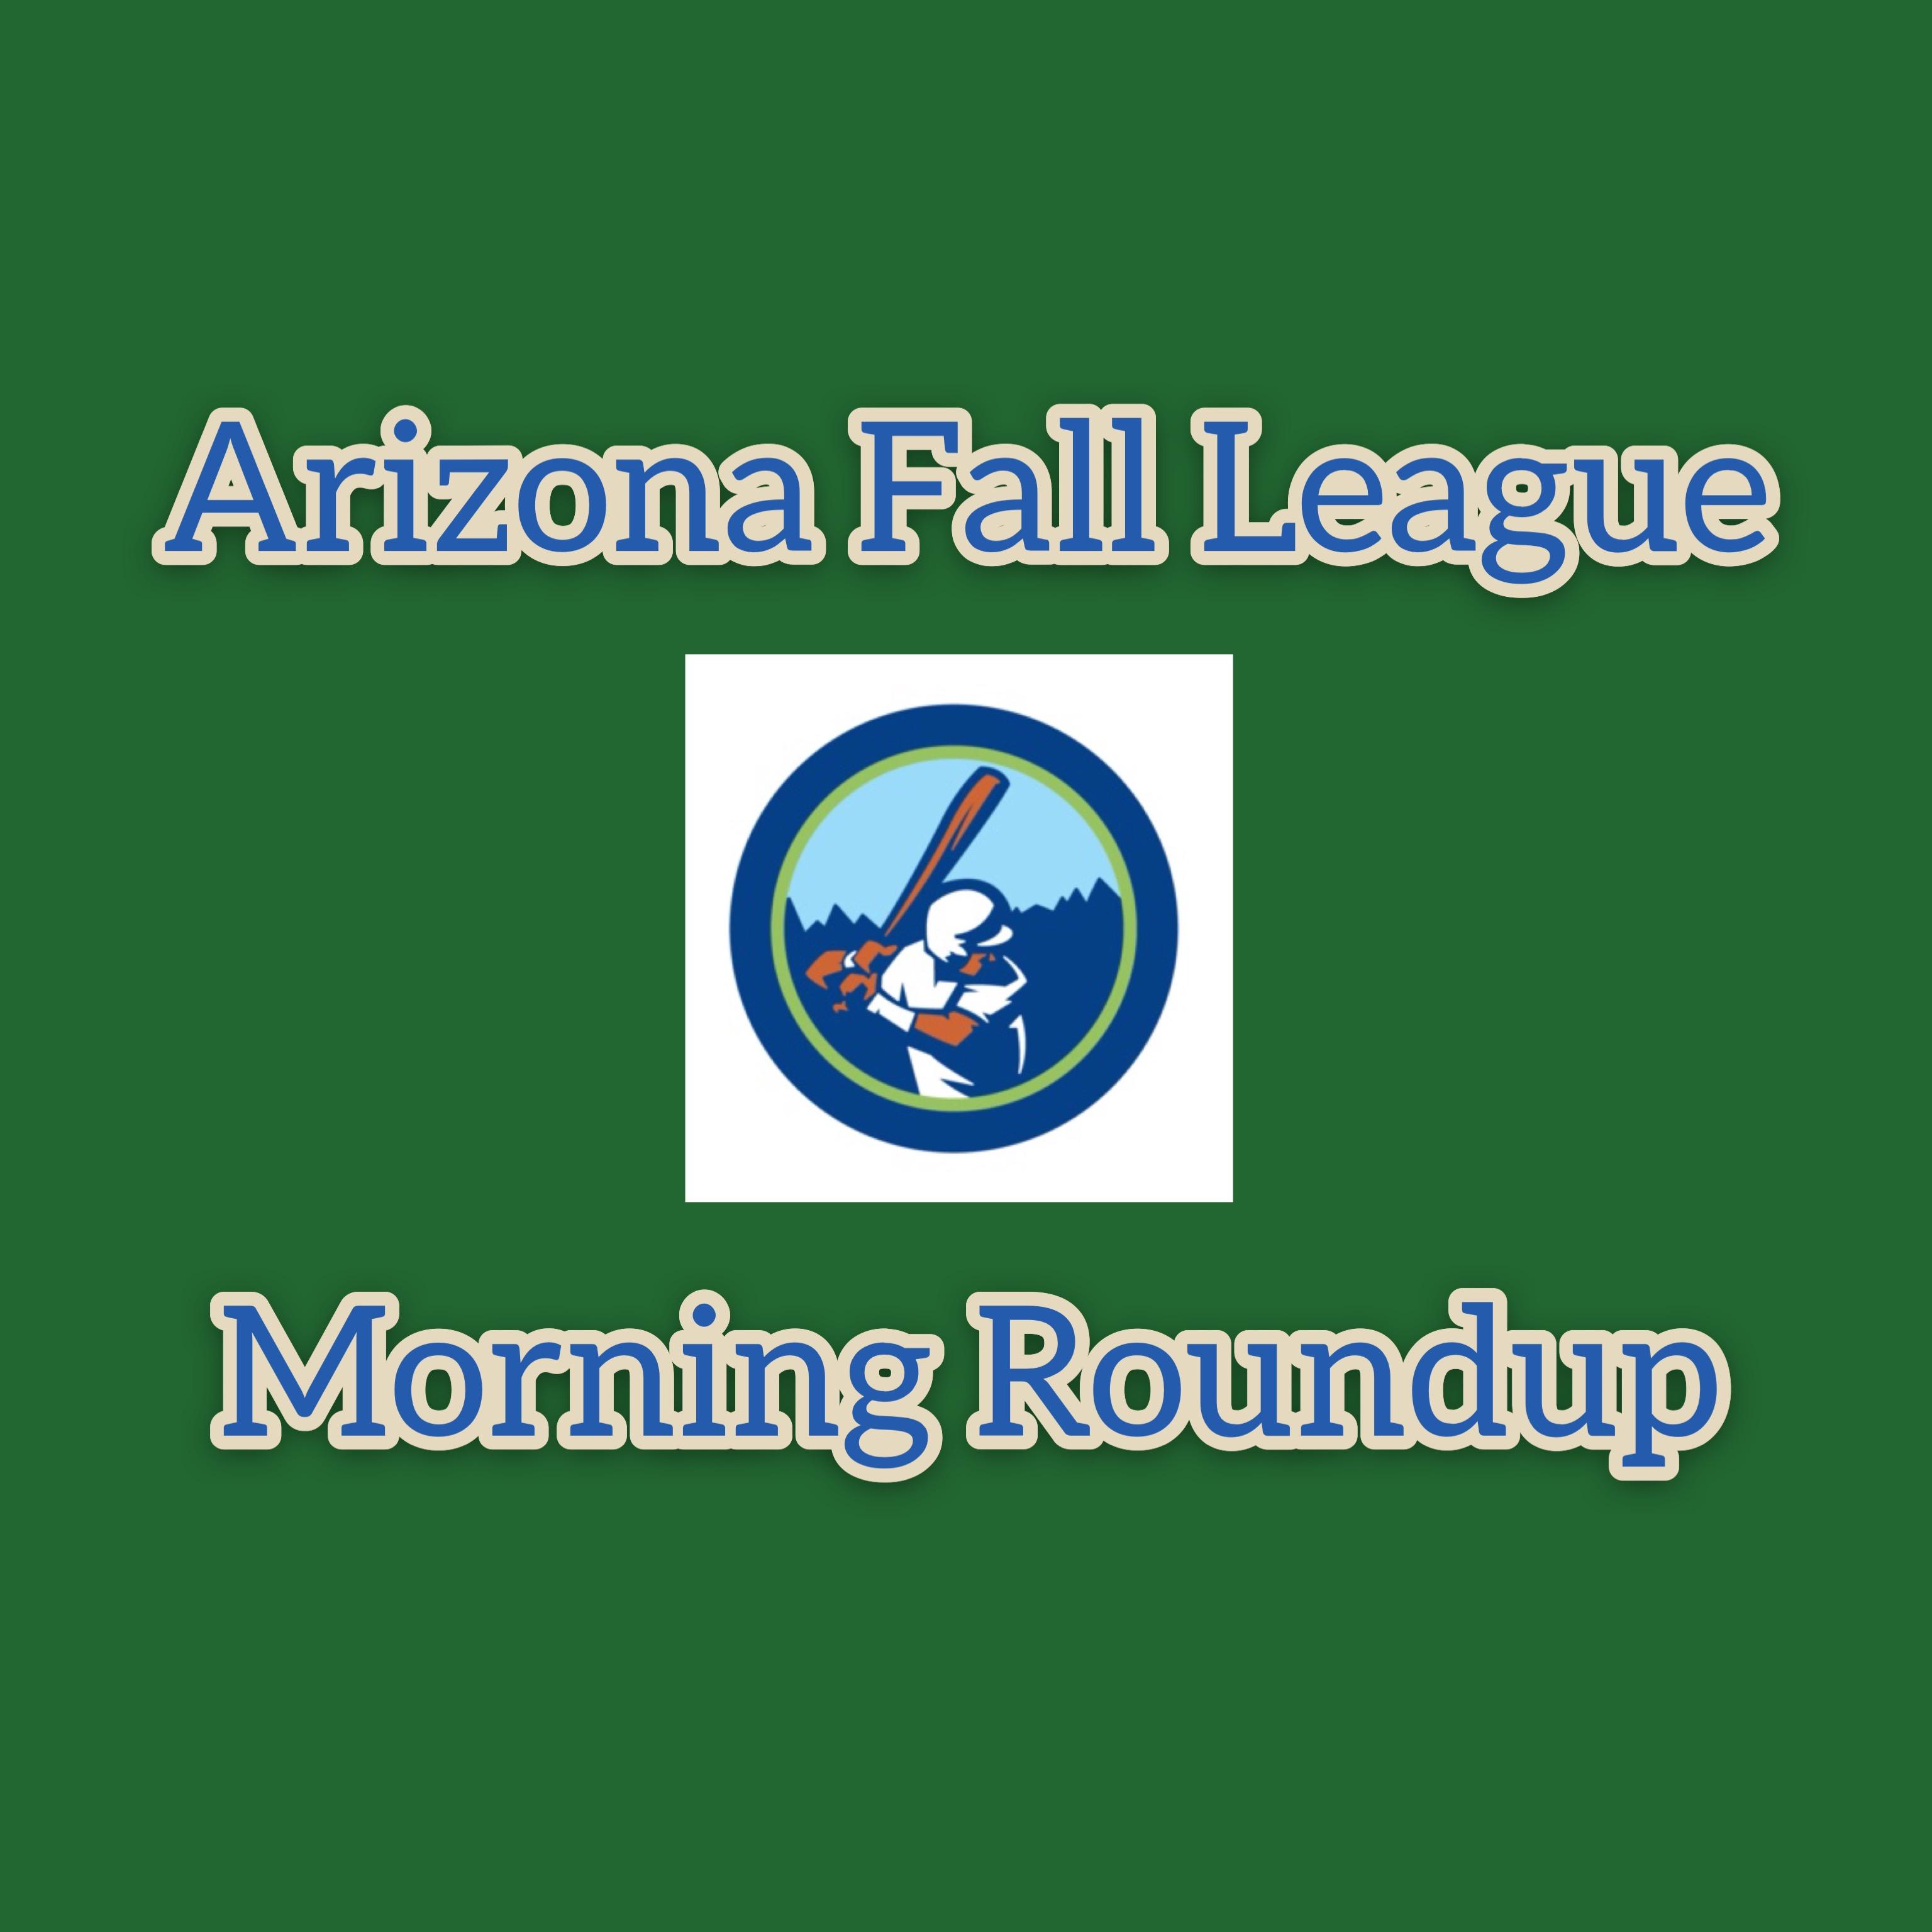 AFL Morning Roundup